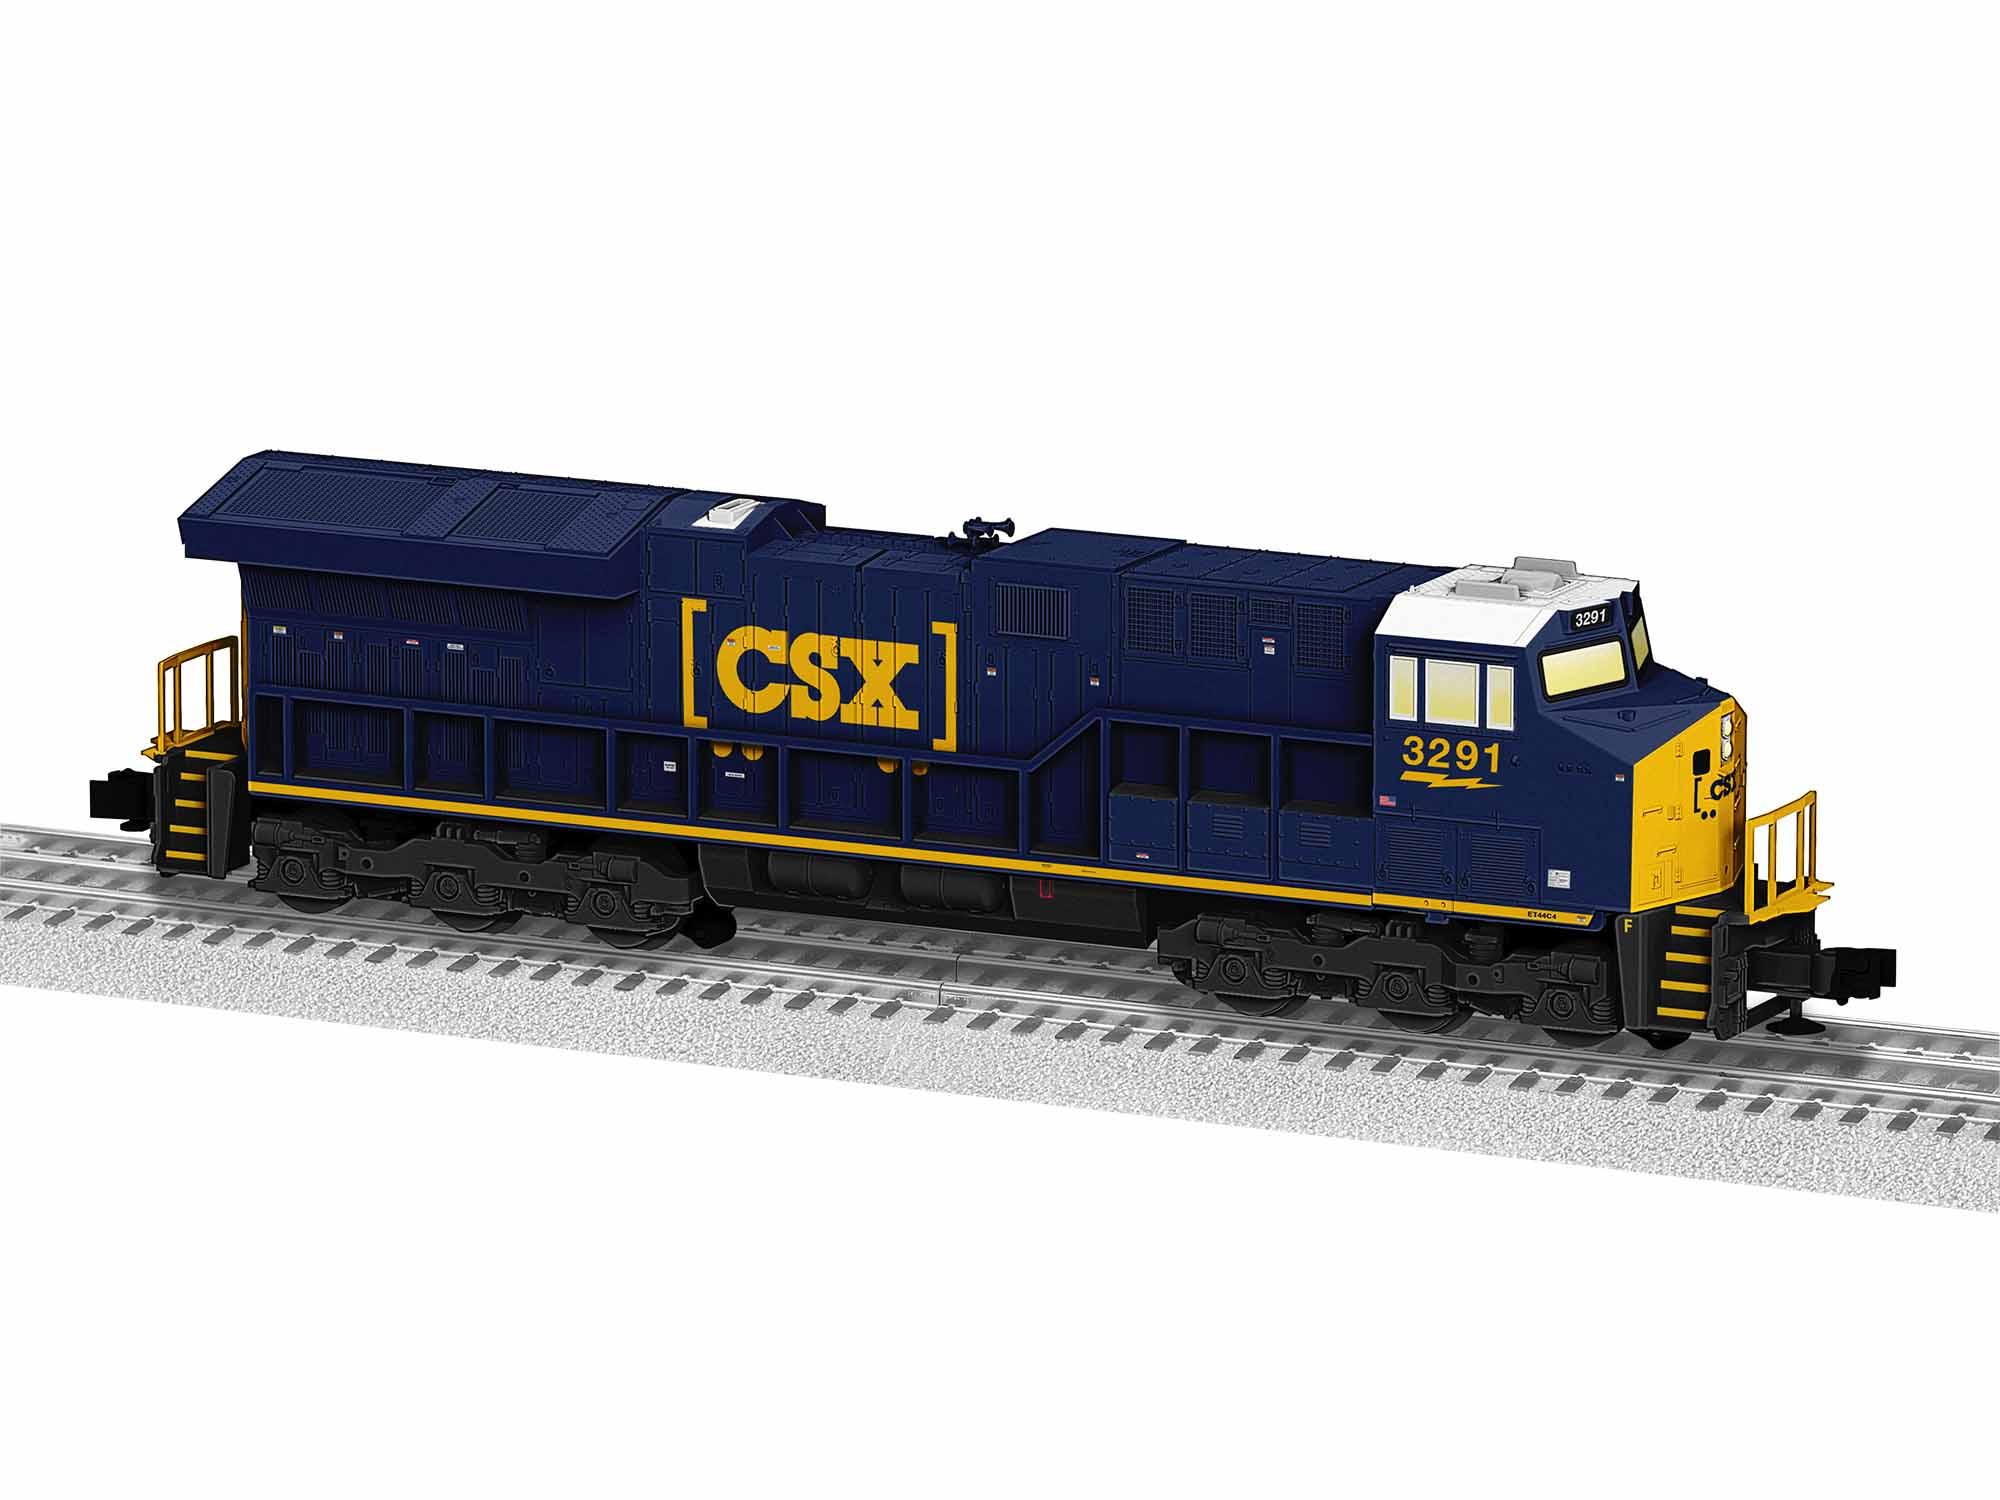 LNL1934022 Lionel O-31 ET44AC, CSX #3291